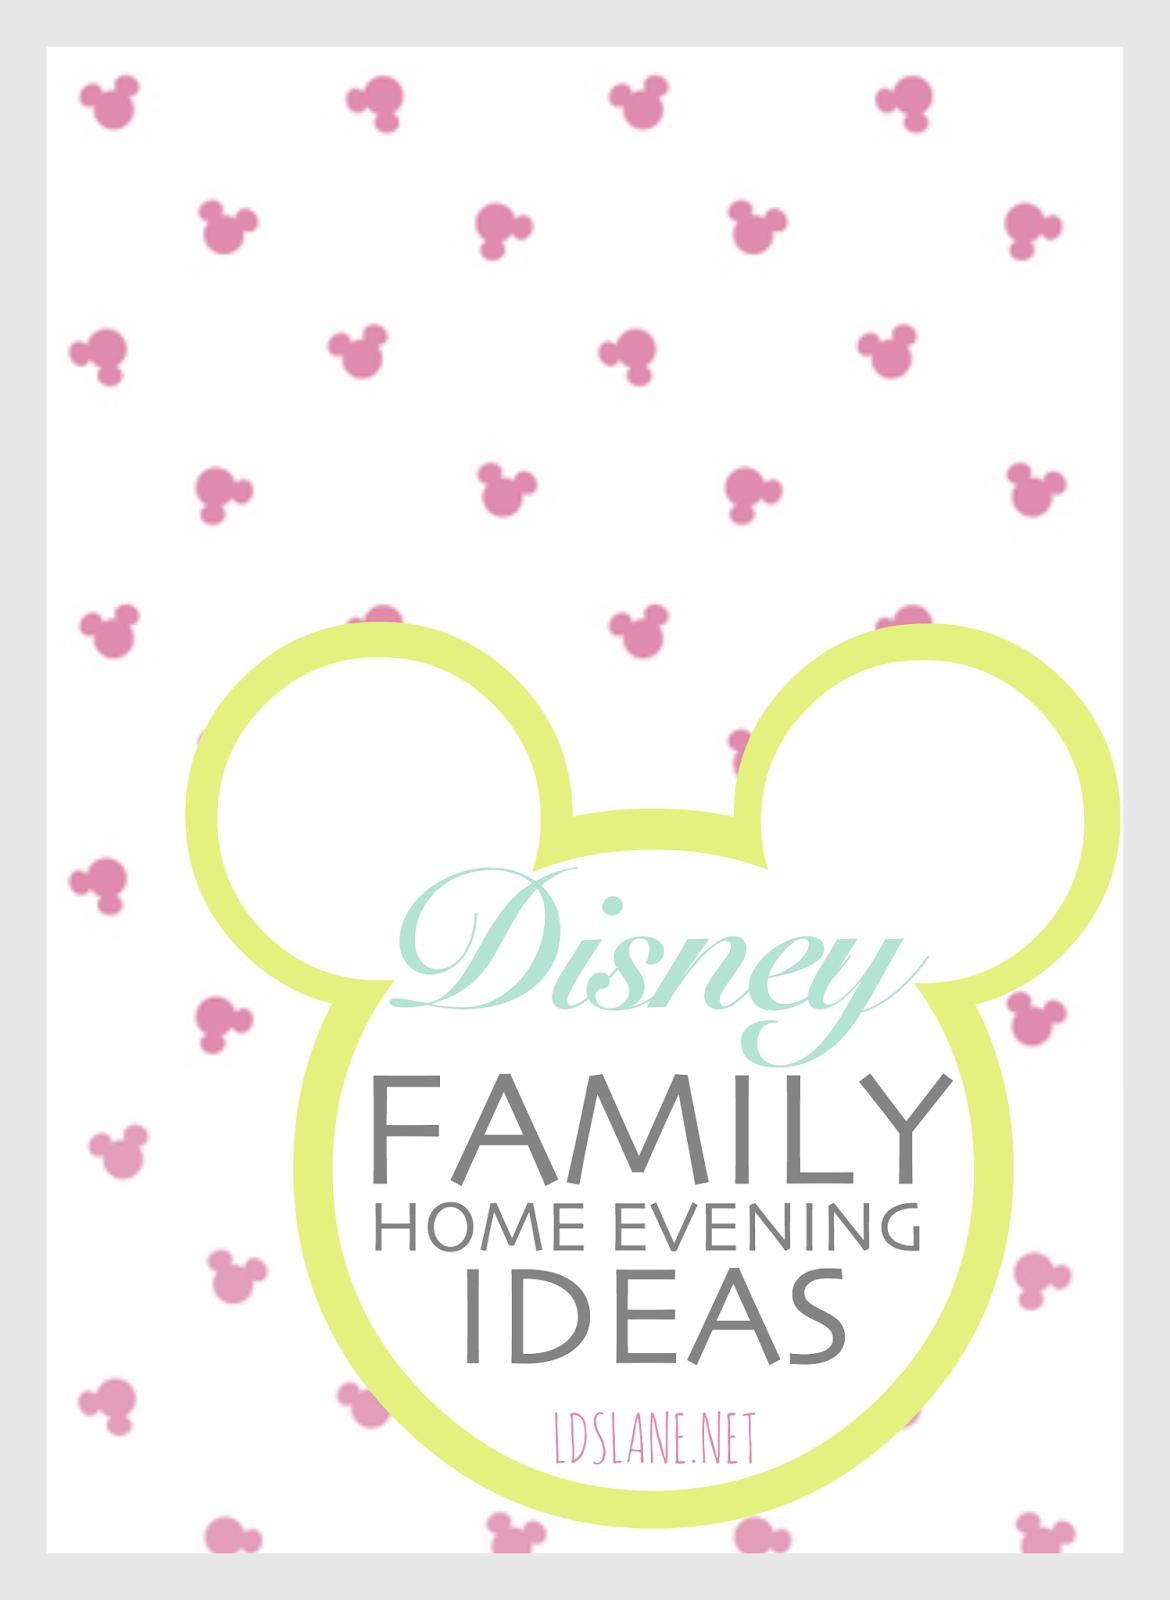 10 Fabulous Lds Family Home Evening Ideas family home evening disney movies lds lane disney movies movie 2020